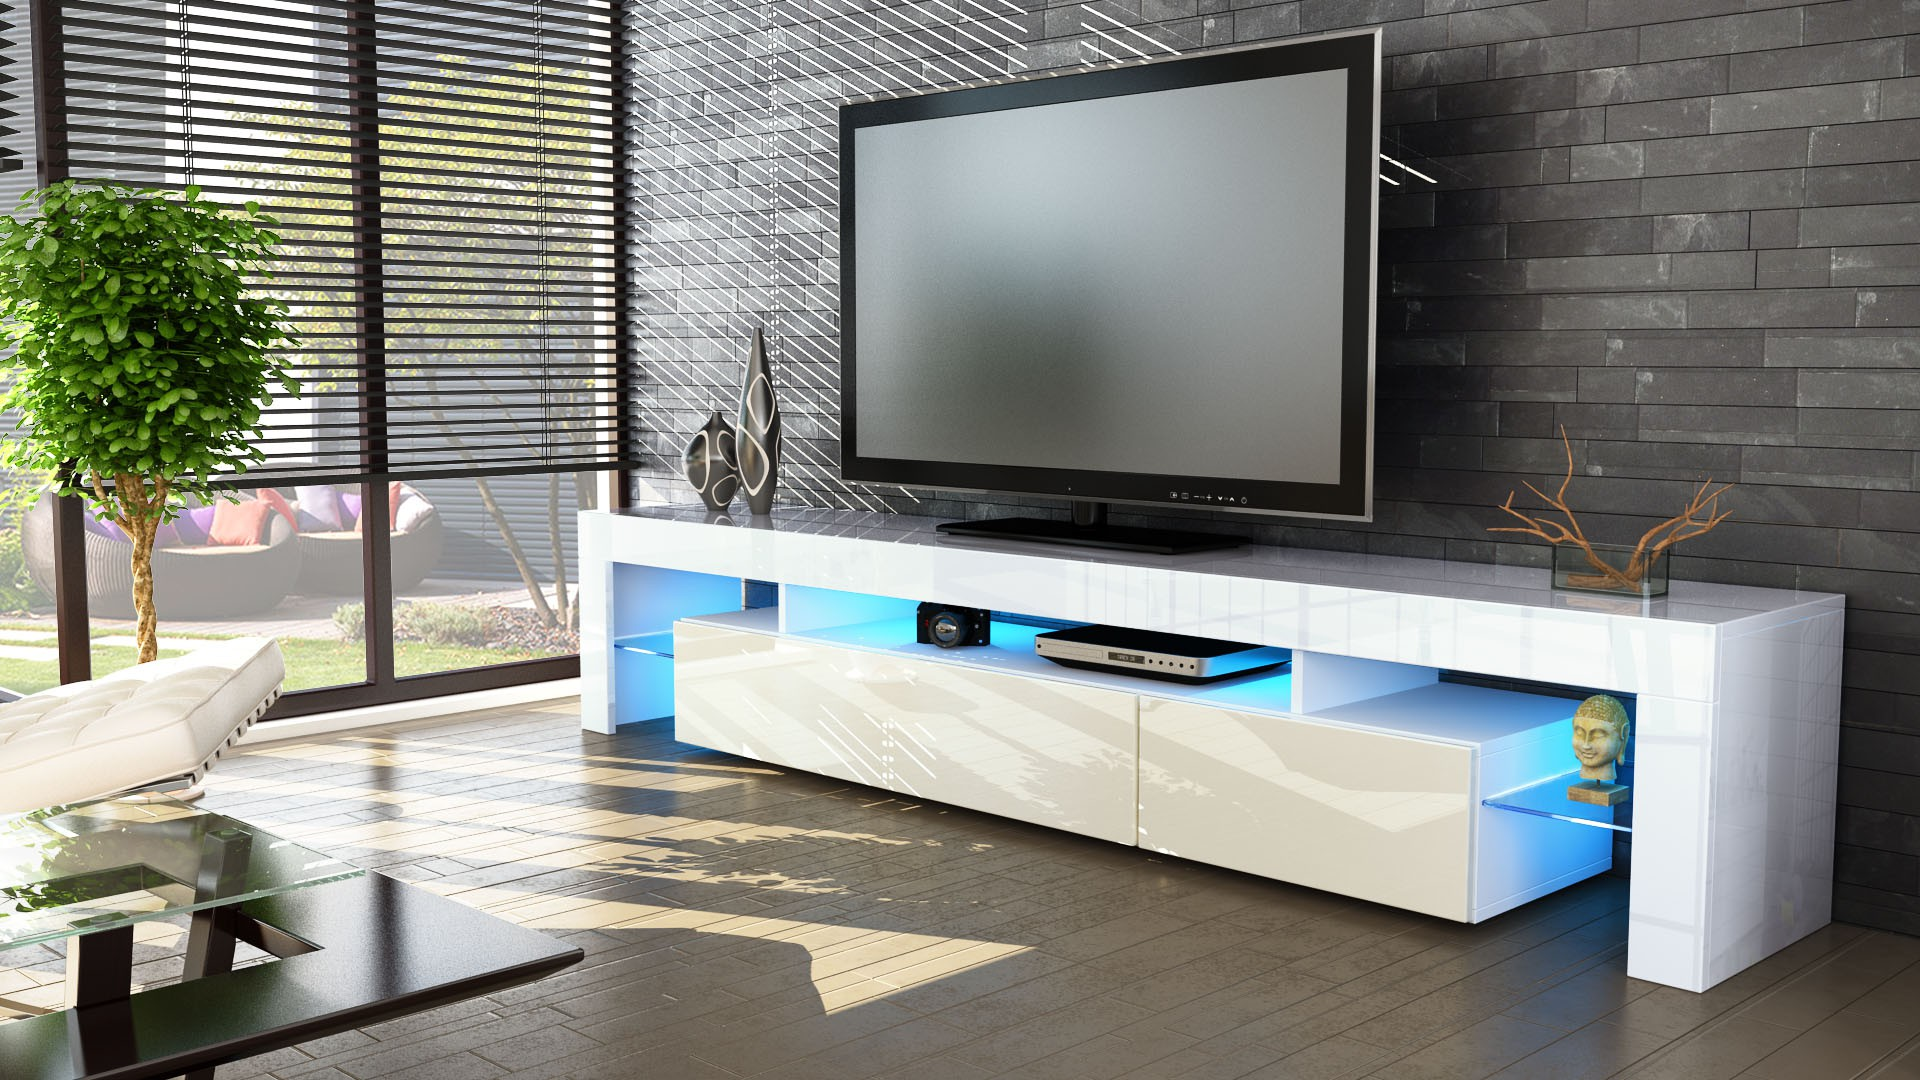 meuble tv blanc et crme 189 cm avec led - Meuble Tv Bas Avec Led